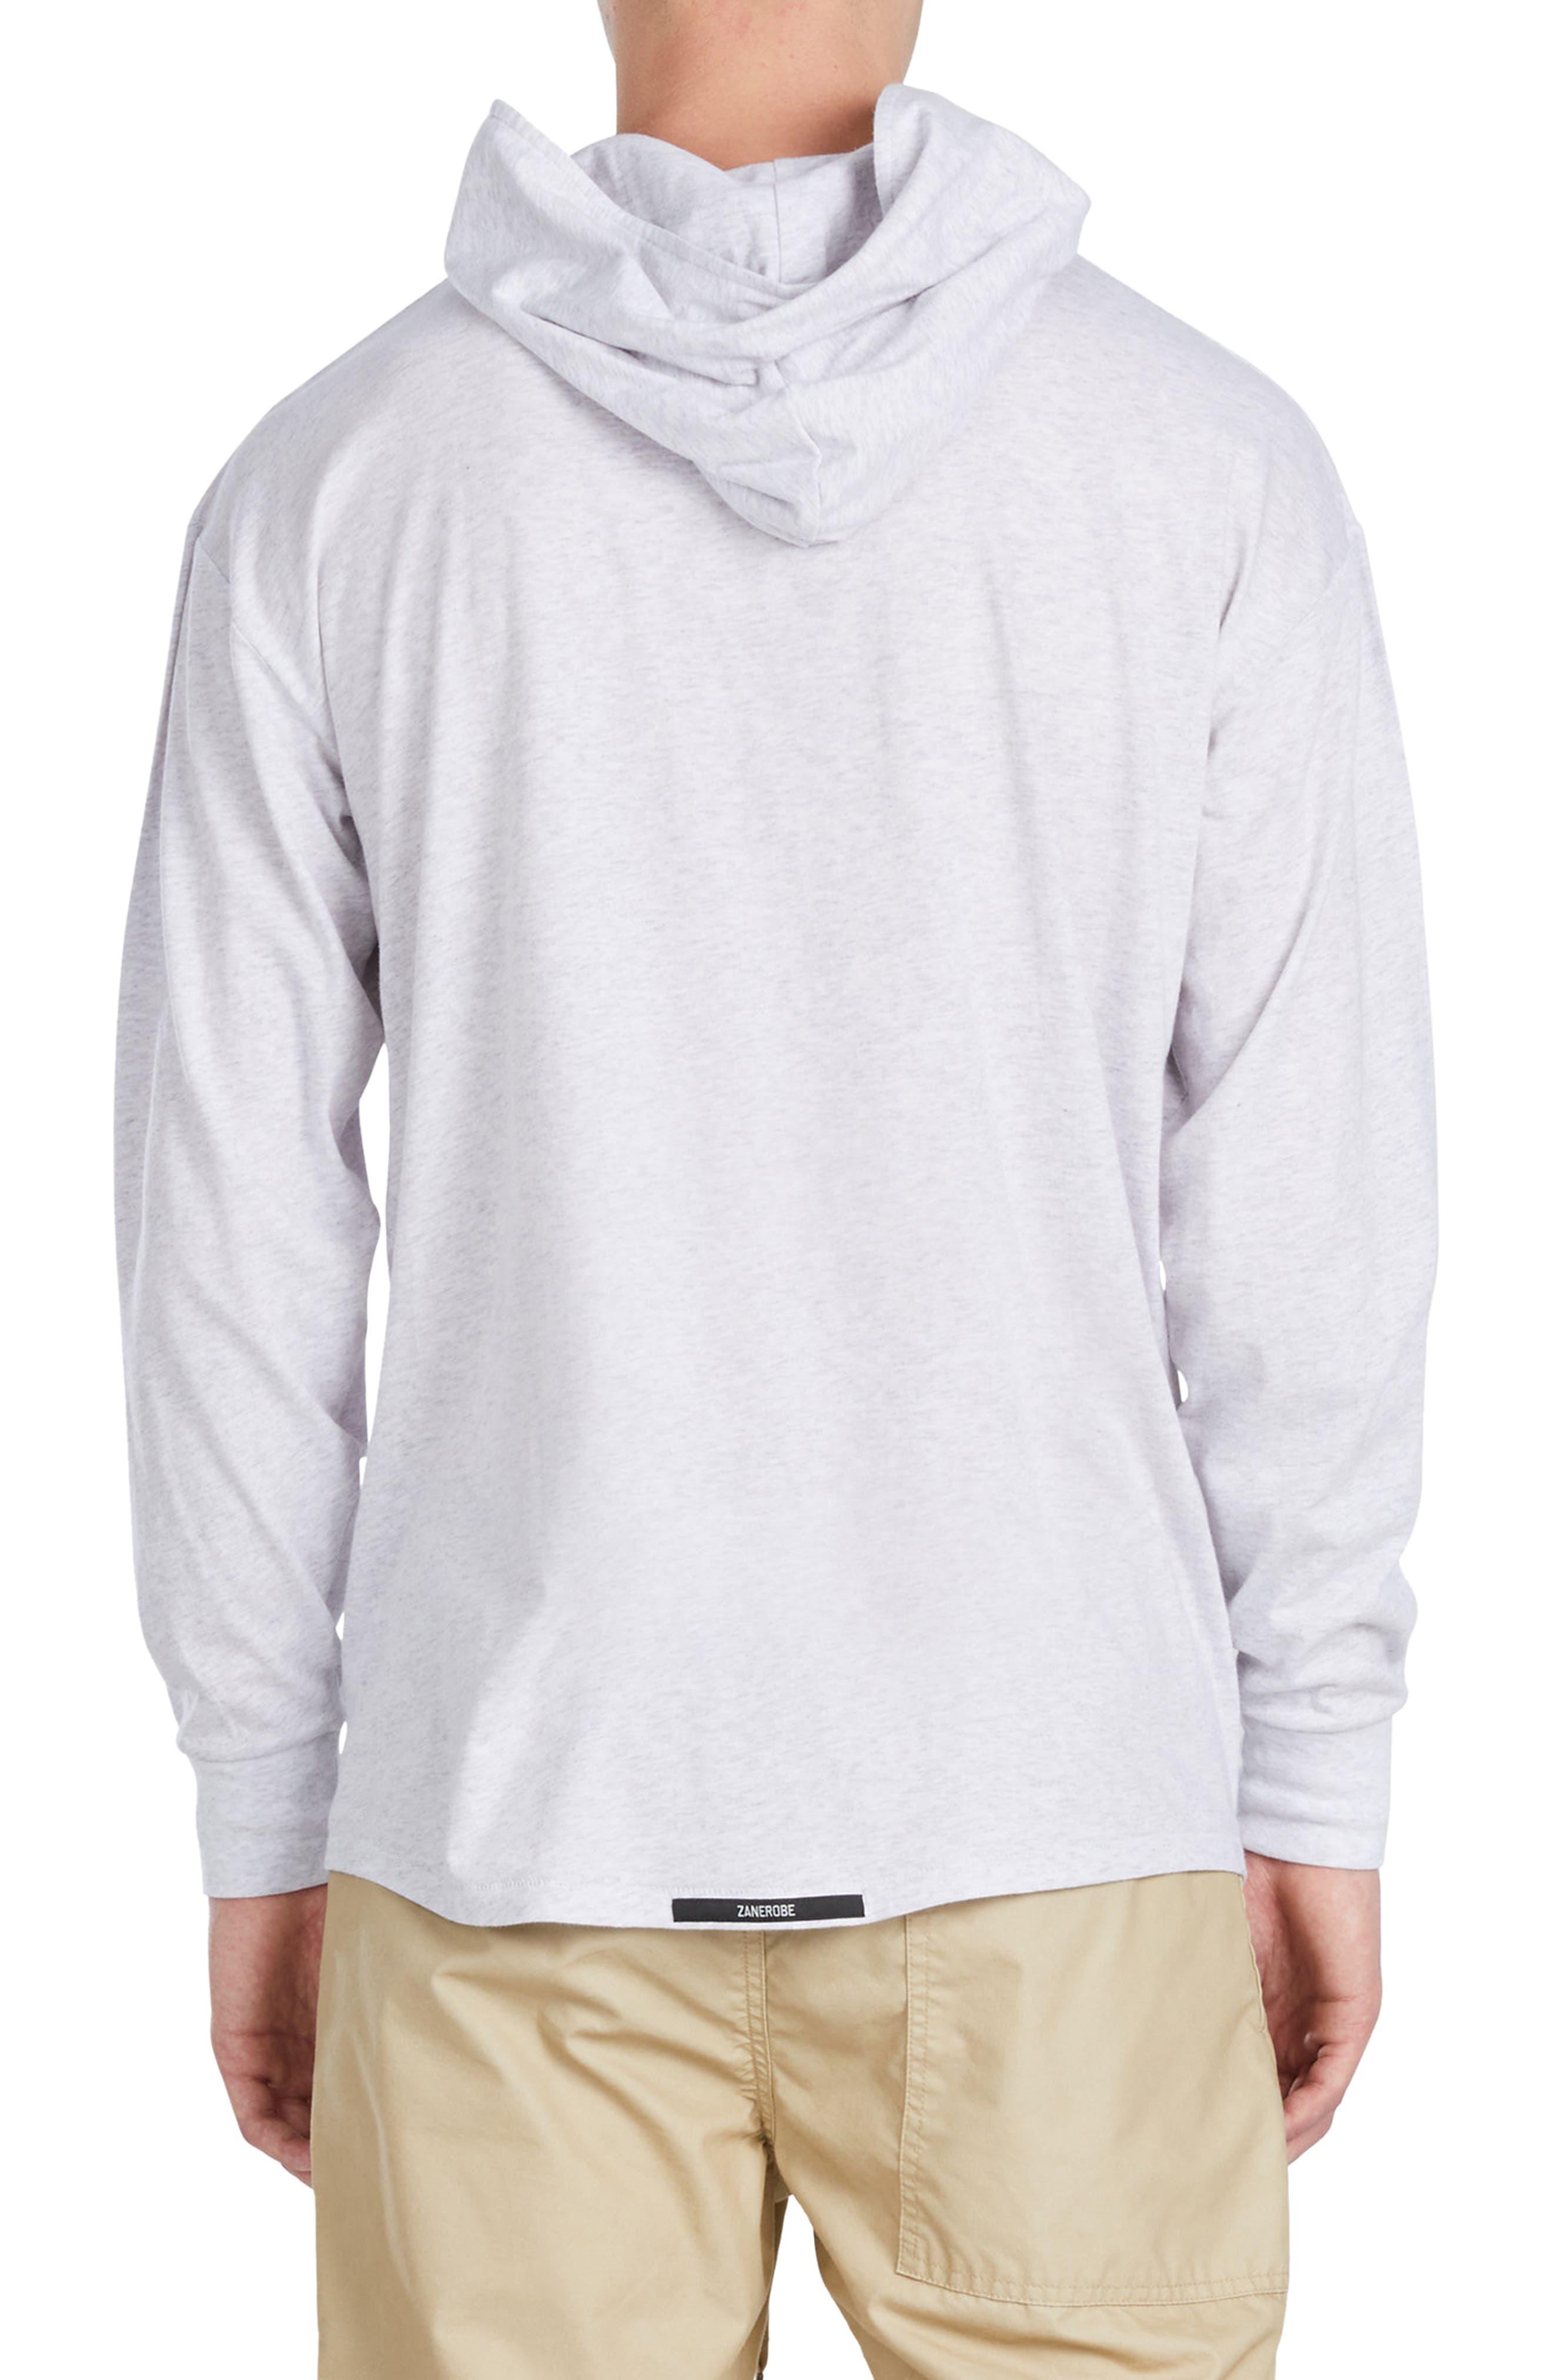 Rugger Long Sleeve Hooded T-Shirt,                             Alternate thumbnail 2, color,                             051